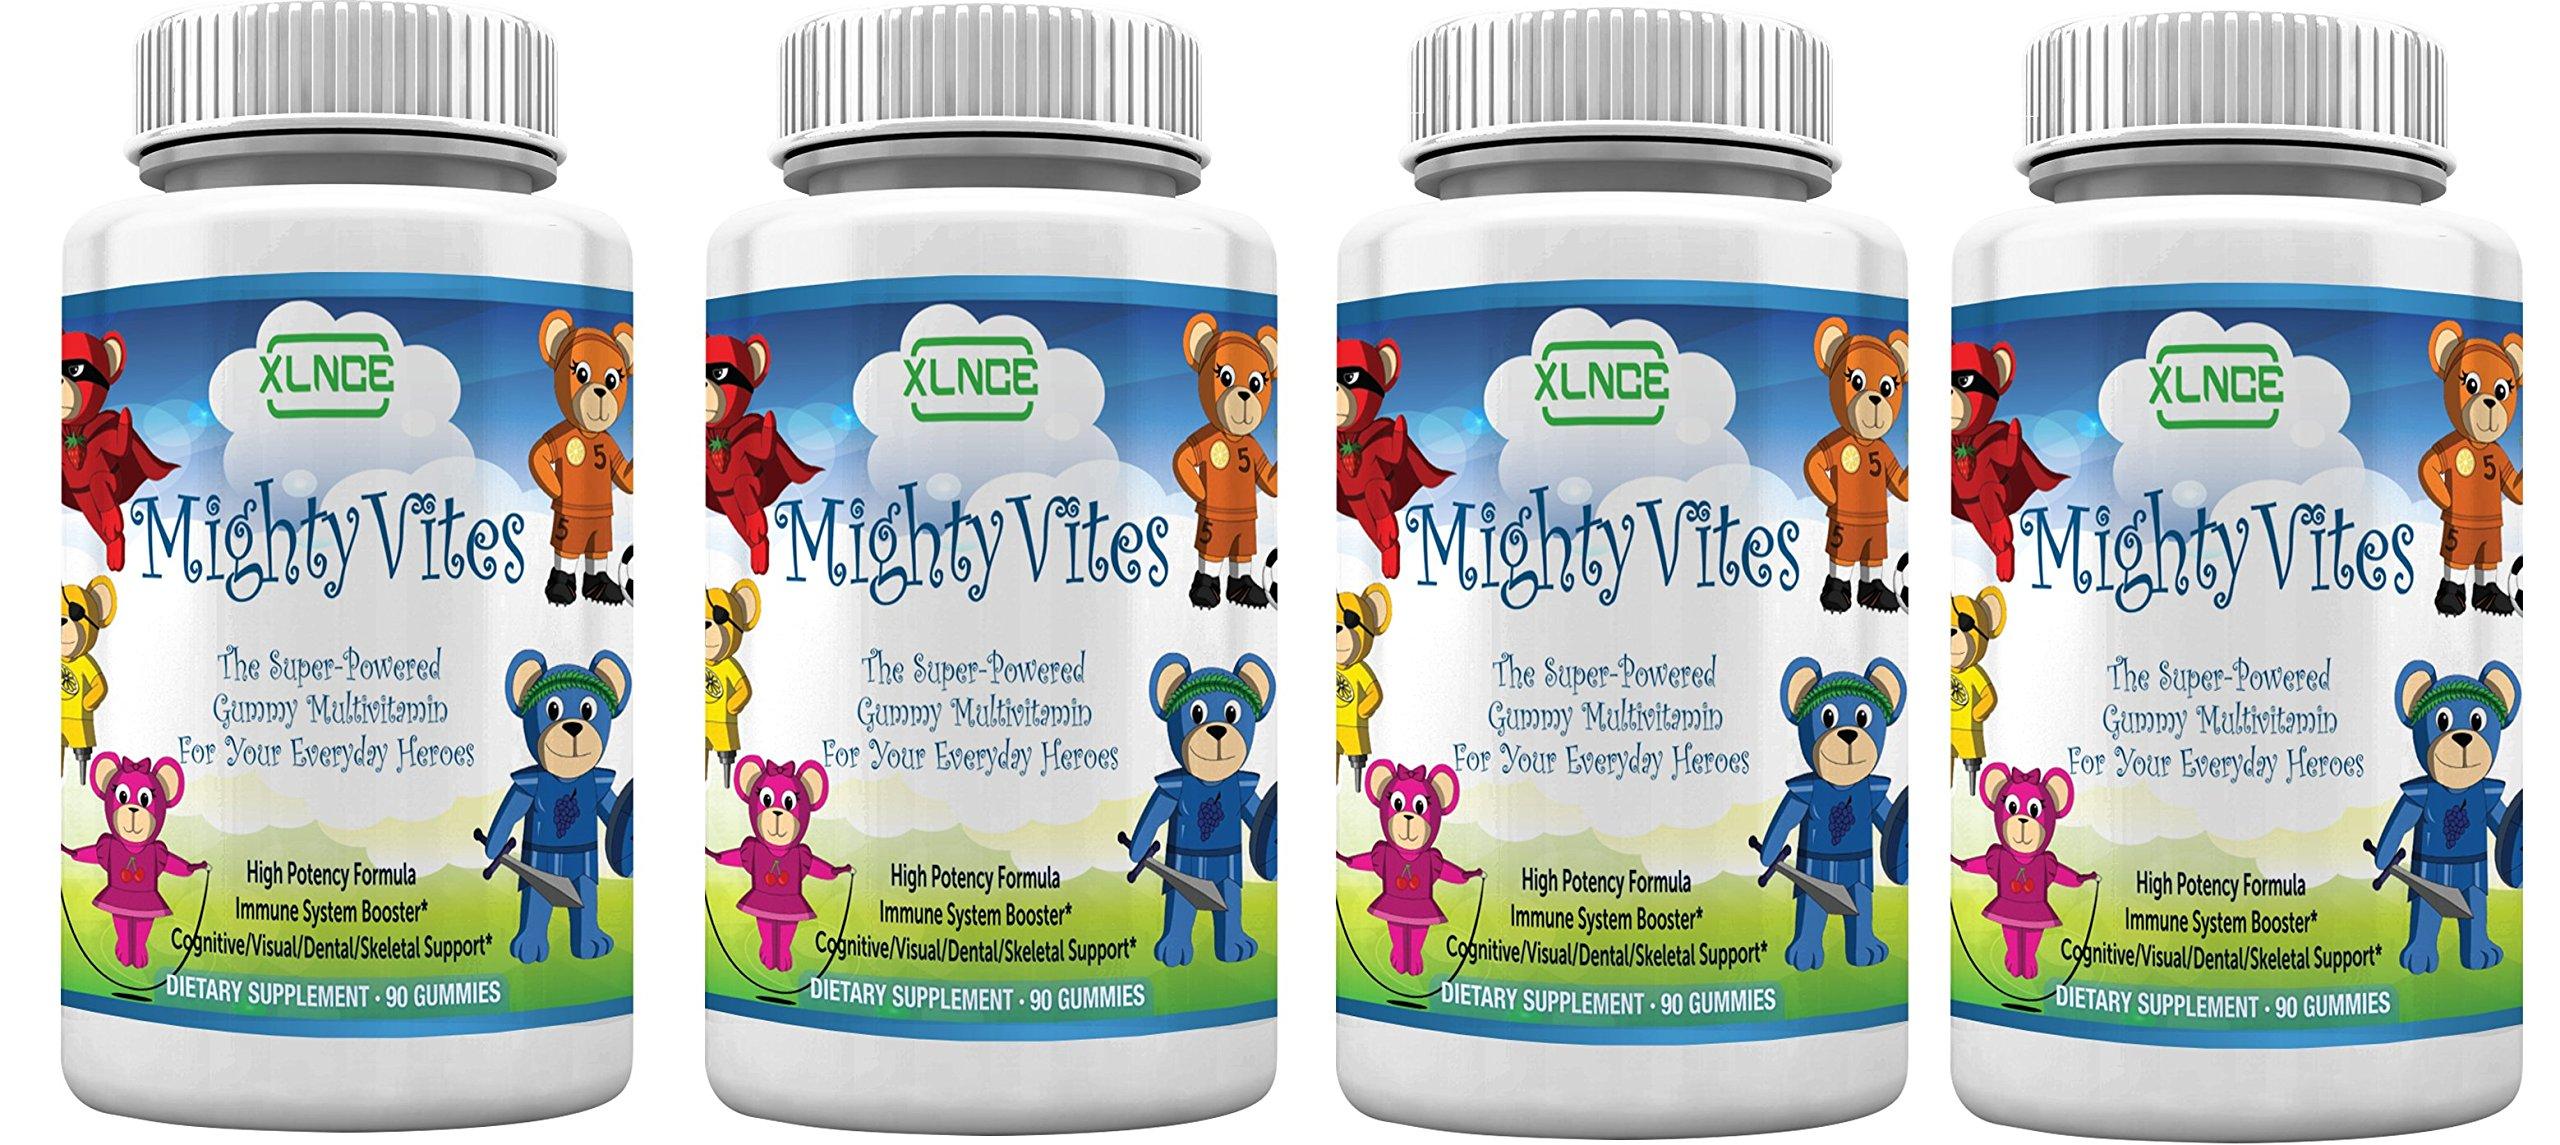 Pack of 4 Children Multivitamin Gummies by XLNCE - Gummy Vitamins Boost Immune System Health in Kids, Toddlers, Teens, Men & Women. Best Natural Chewable Multivitamins. Add Multi Items to Cart NOW!